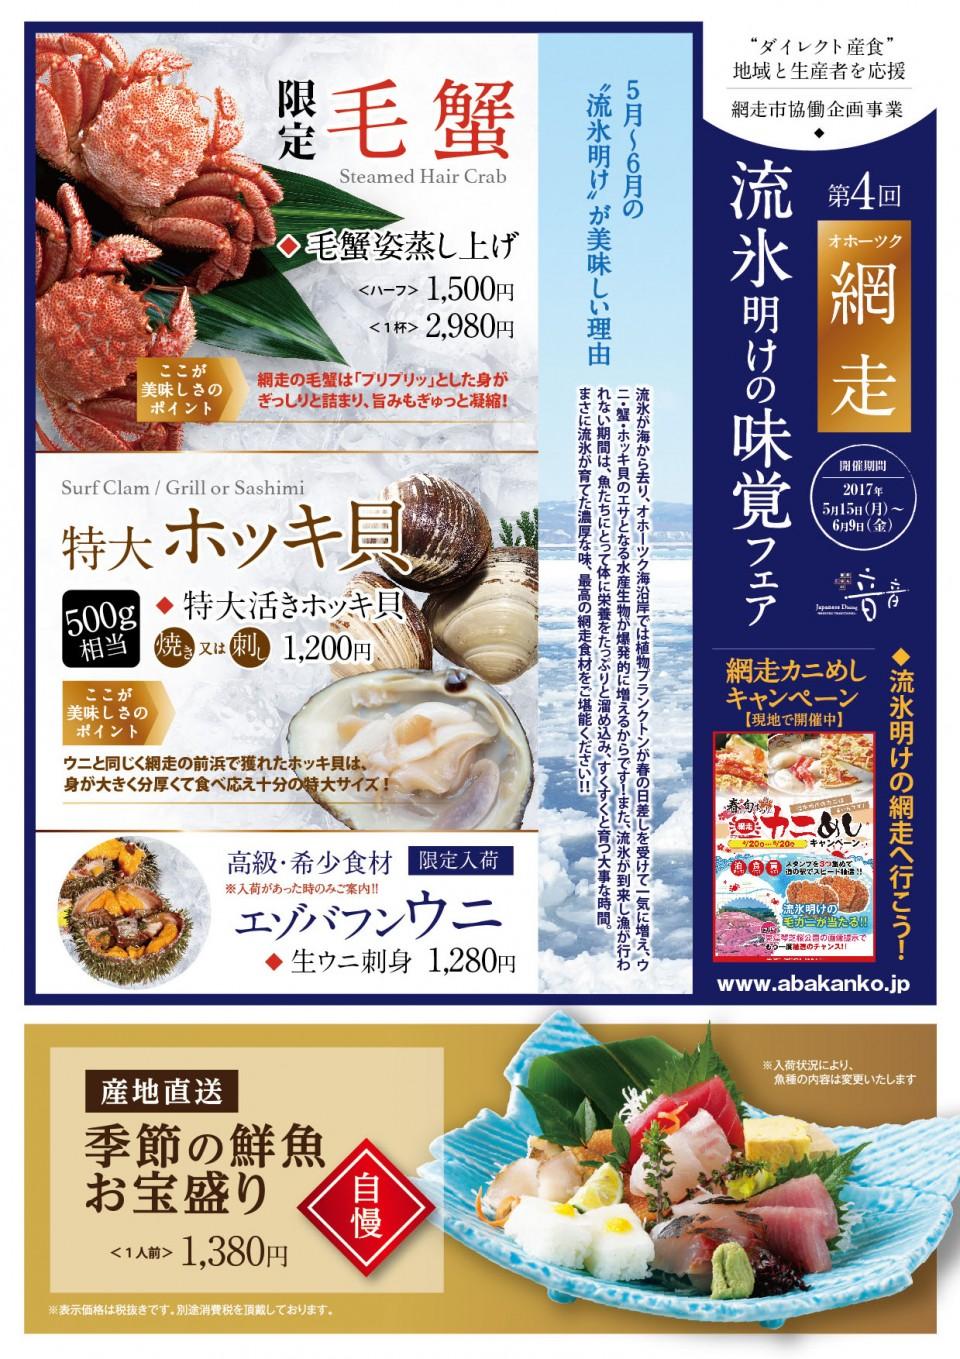 018873-001_abashiri_A4_otooto_FIX_cs6